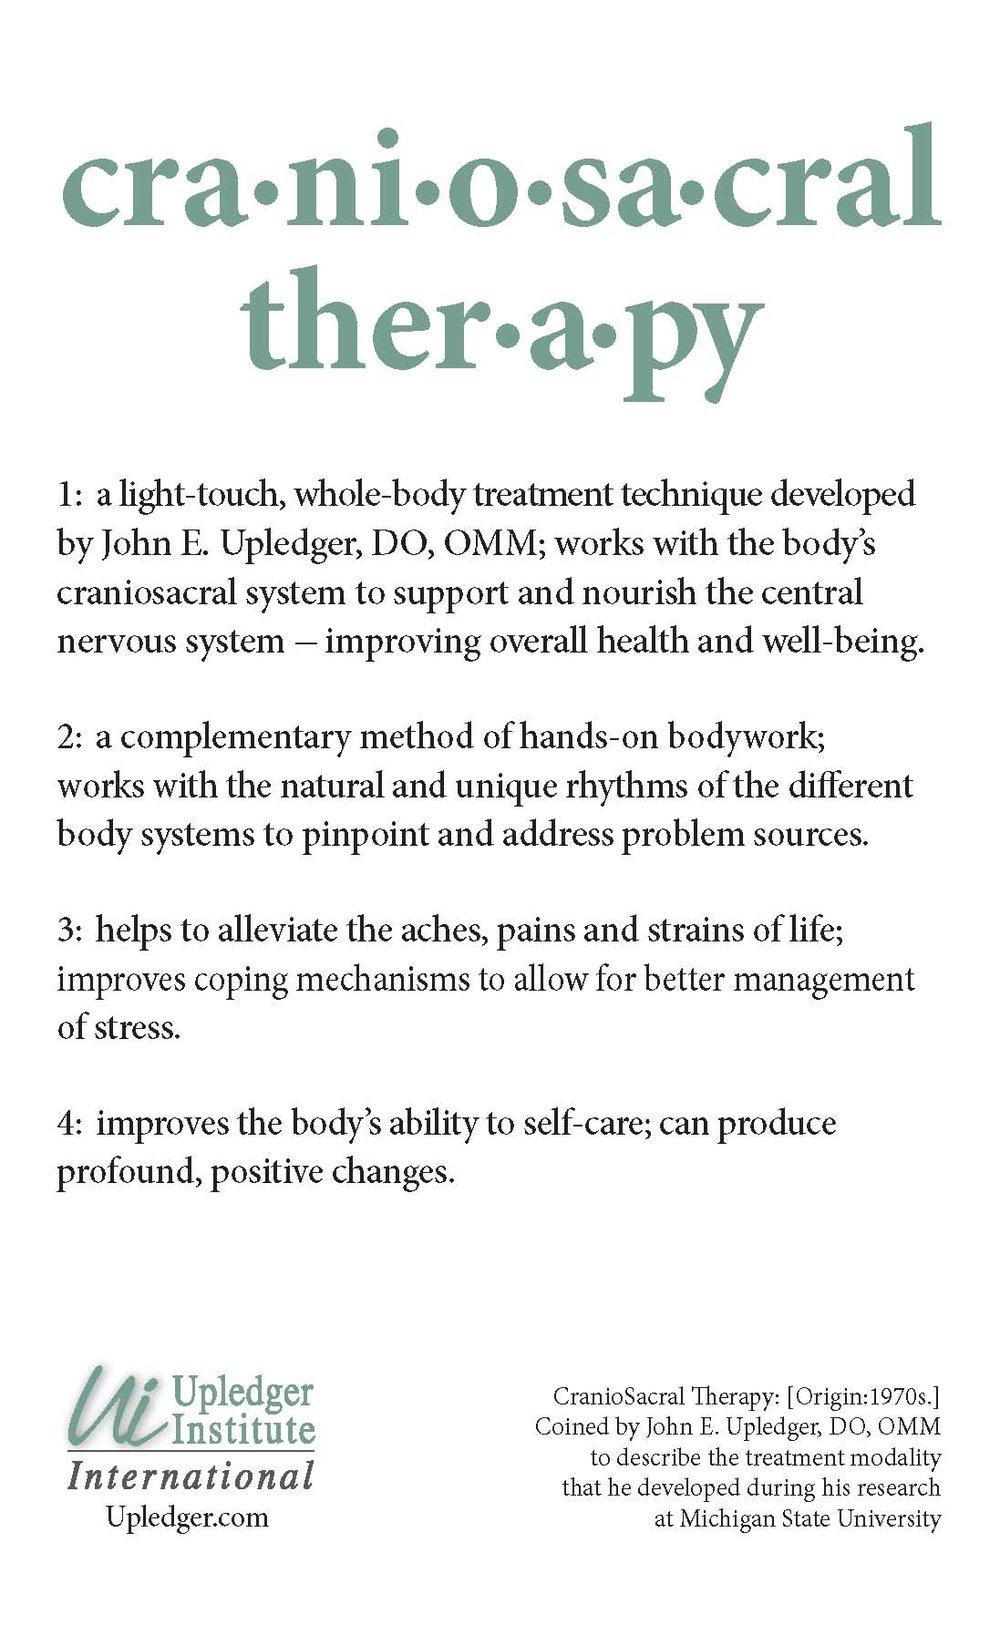 CranioSacral Therapy.jpg